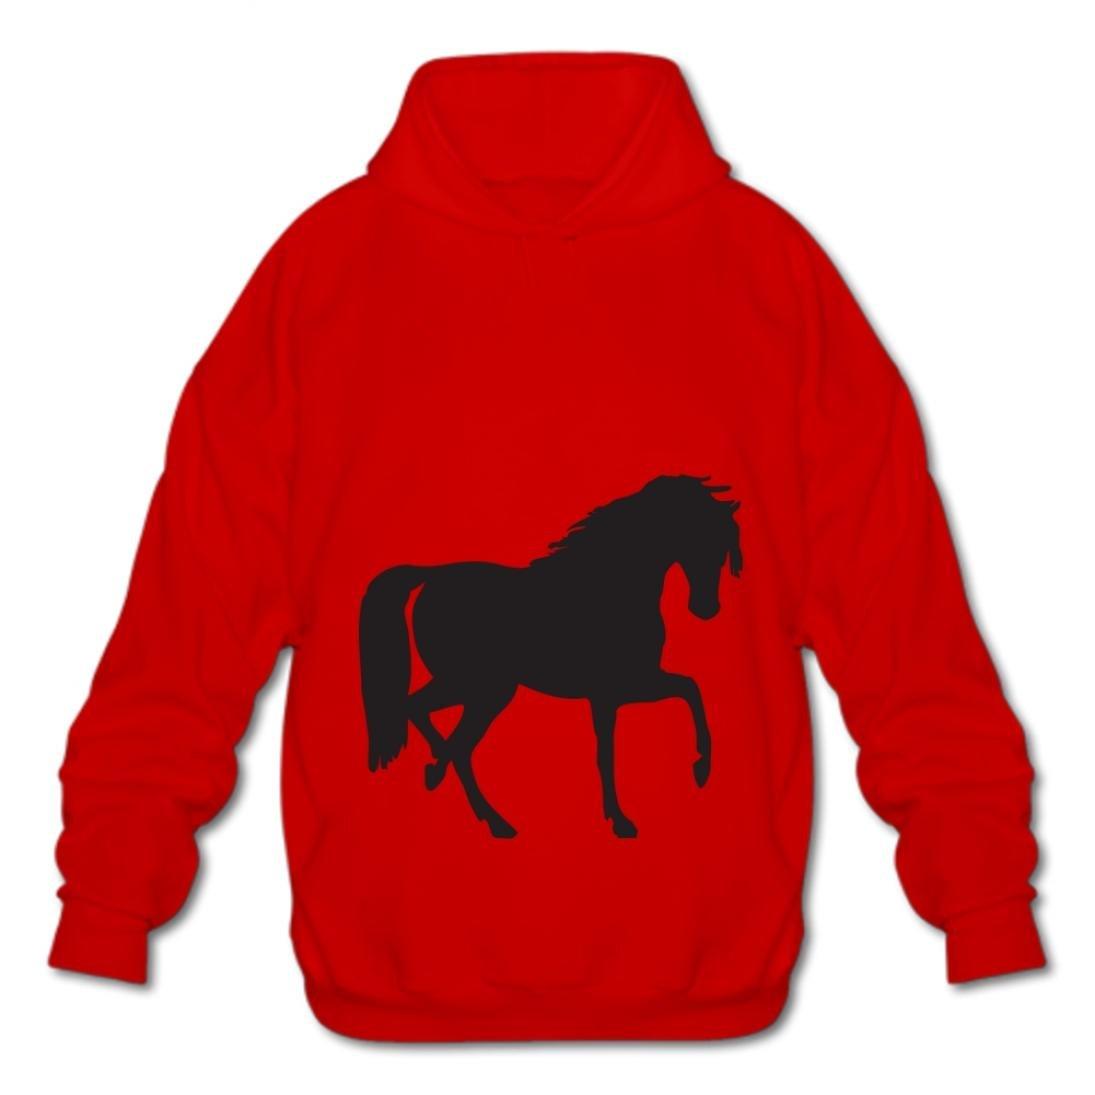 Foxinjishuc Cotton Pullover Hoodies Fashion Hoodies-03 Cartoon Horse LUod Men Style Sweatshirt